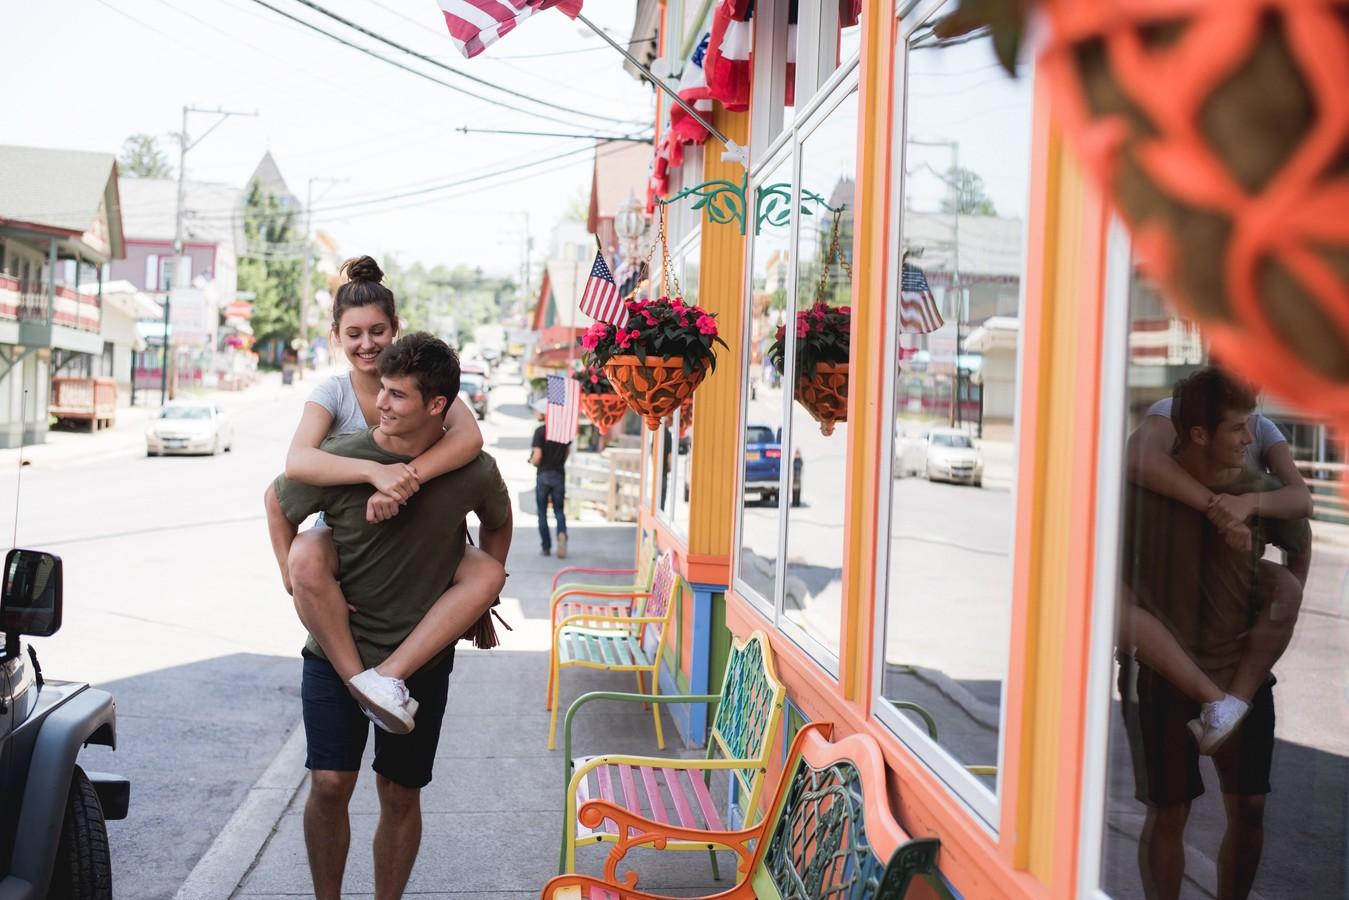 boy giving girl a piggy-back ride